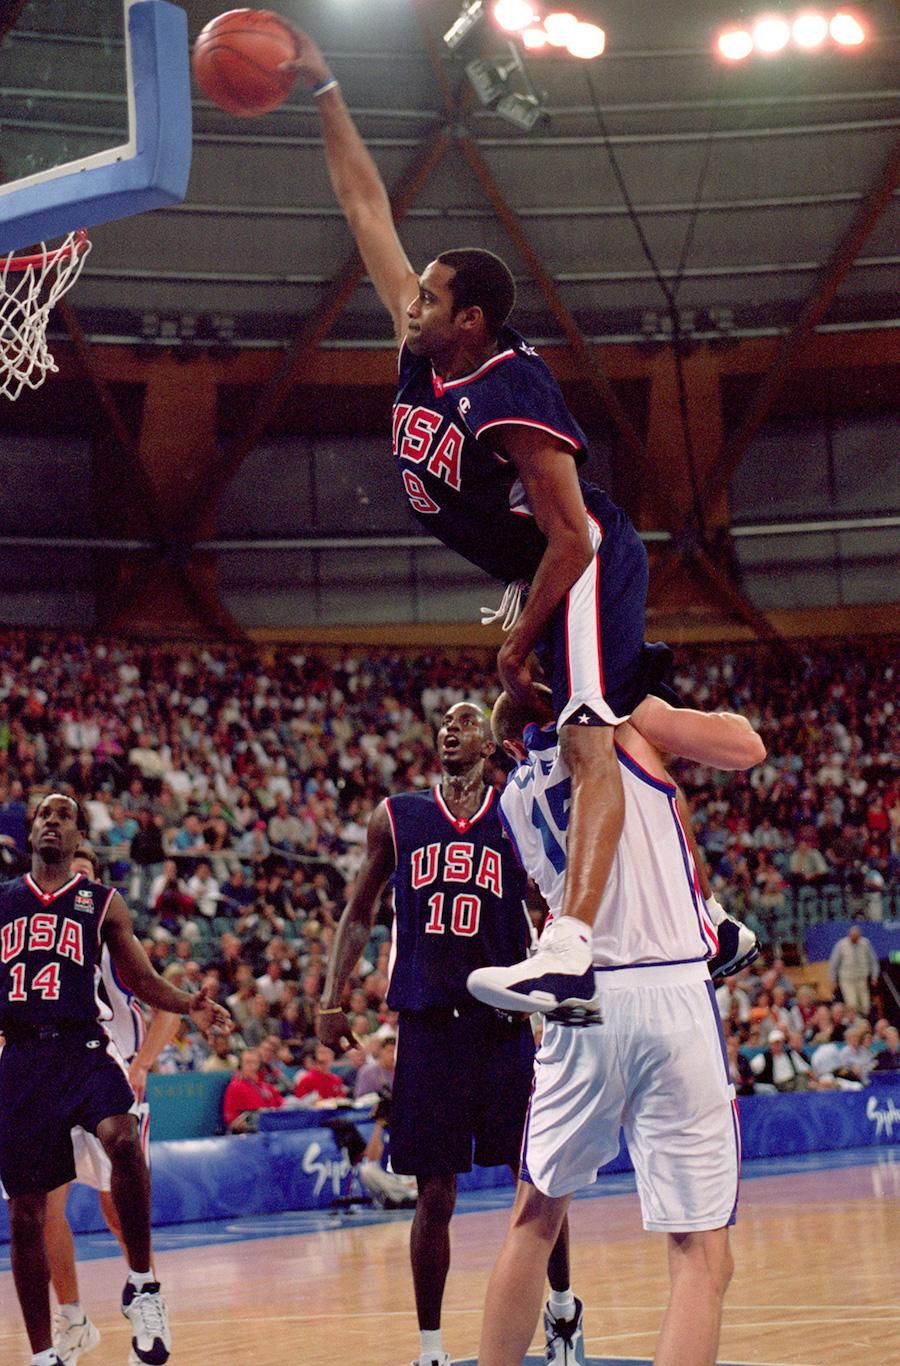 Vince Carter Nike Shox BB4 2000 Sydney Olympics Dunk Frederic Weis